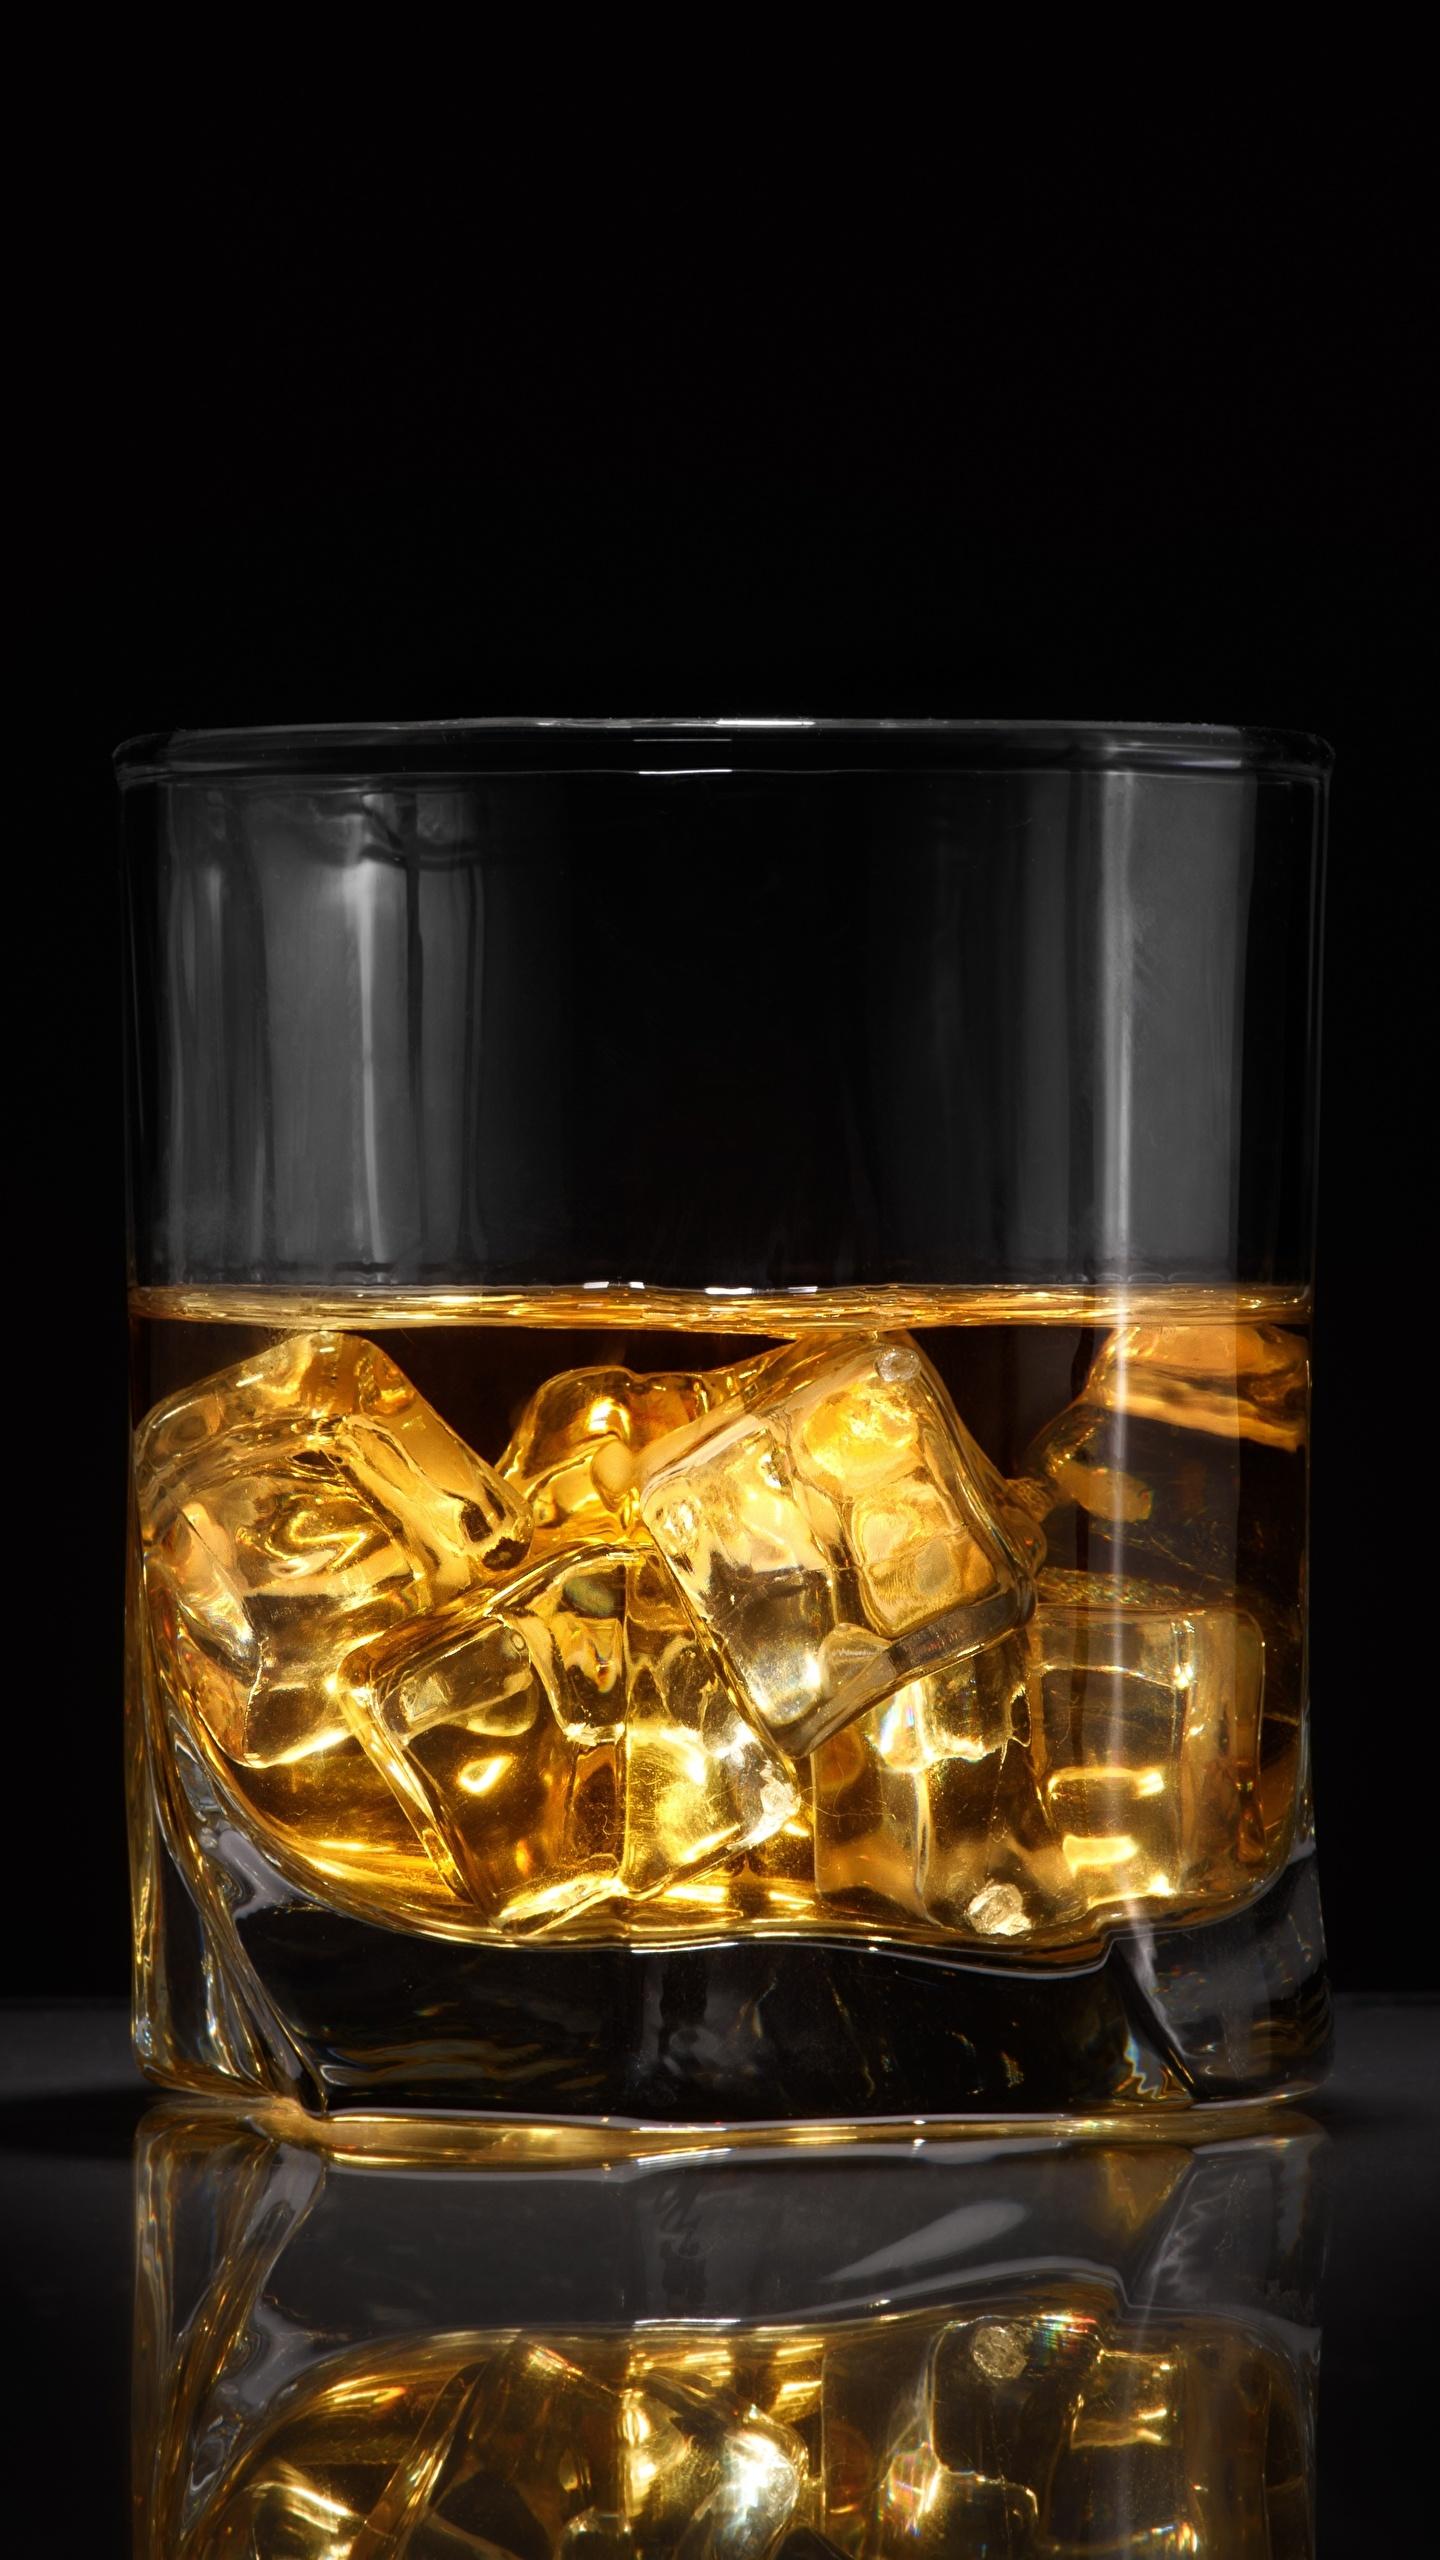 Картинка Лед Виски Стакан Продукты питания 1440x2560 Еда Пища